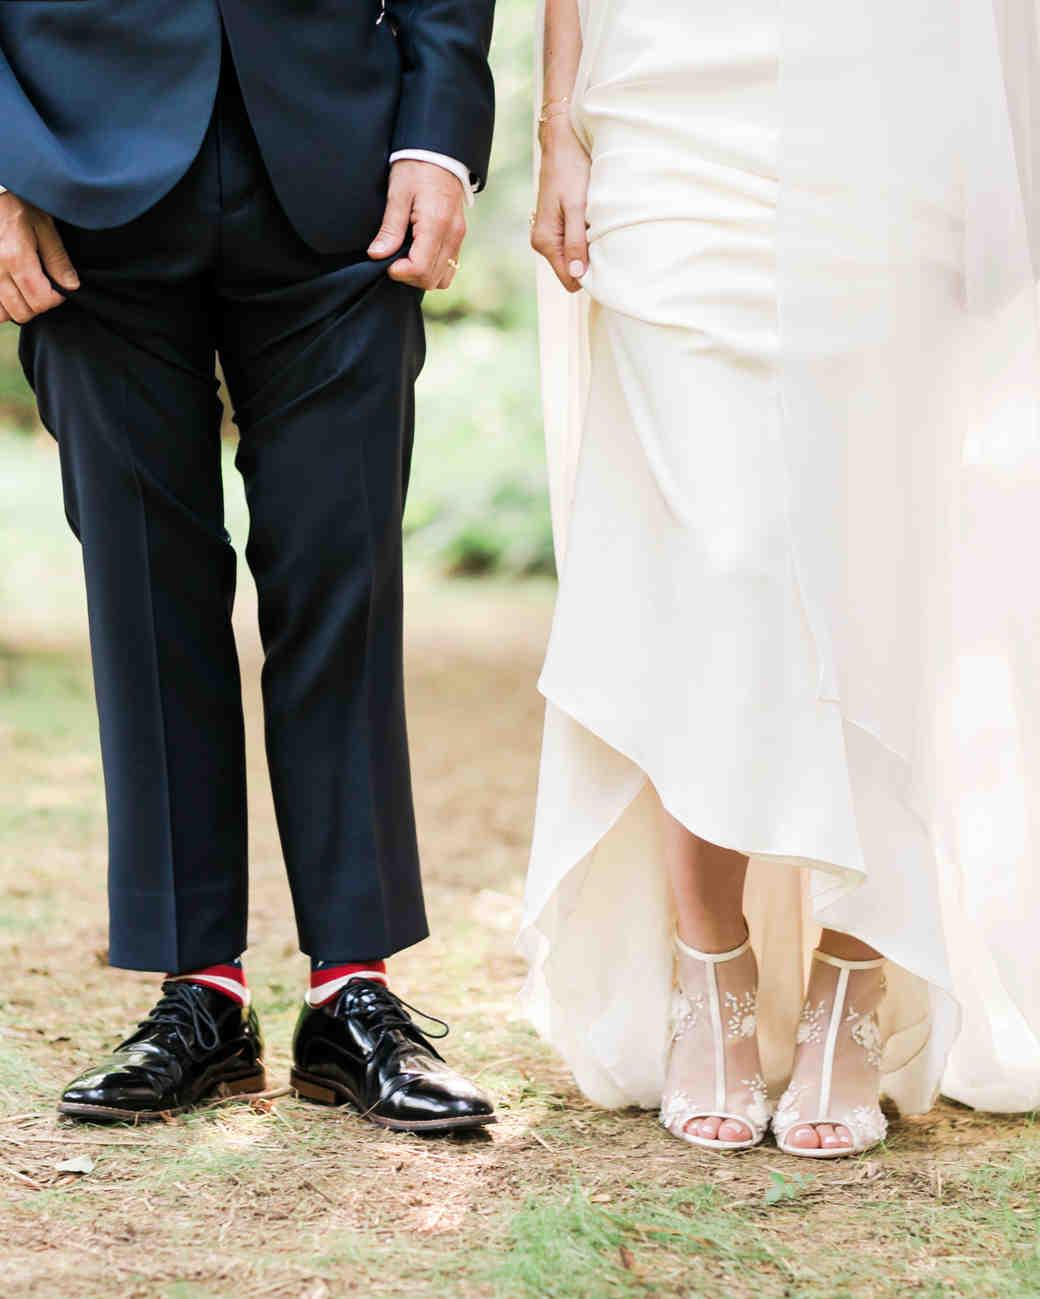 vanessa steven wedding shoes ceremony